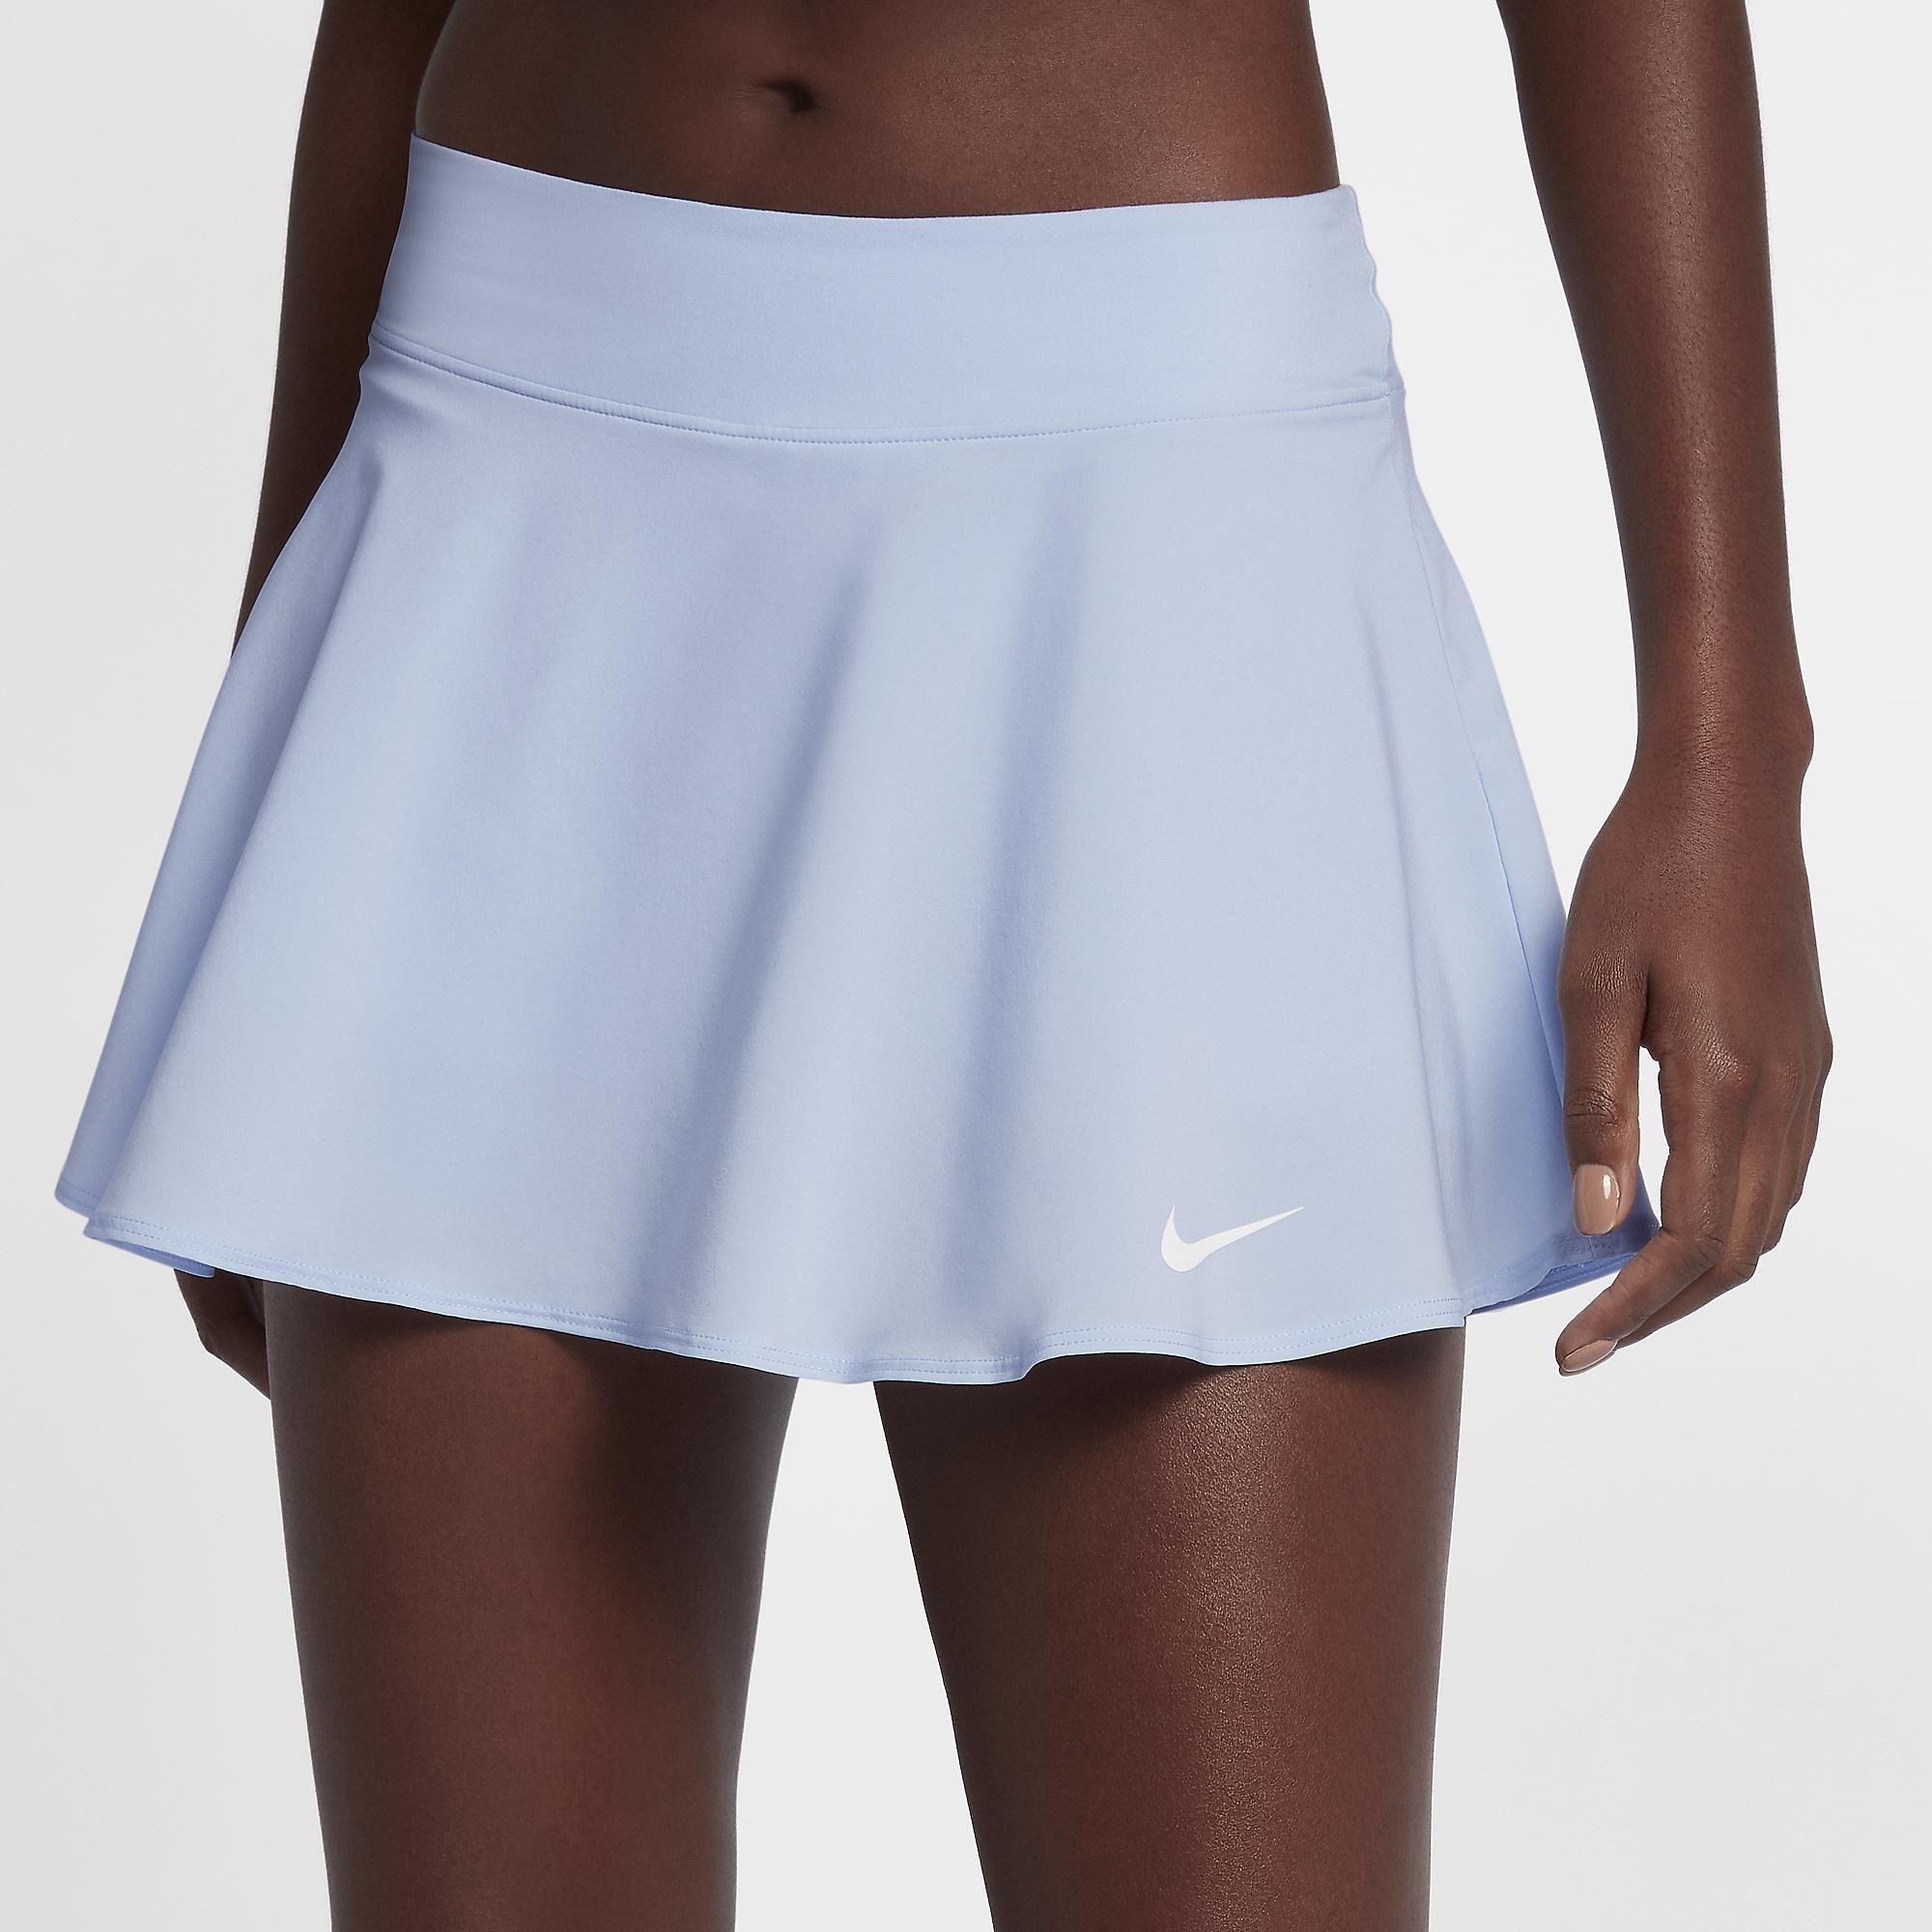 NIKE Tennis Skort Skirt Flouncy Premier Women/'s Size M